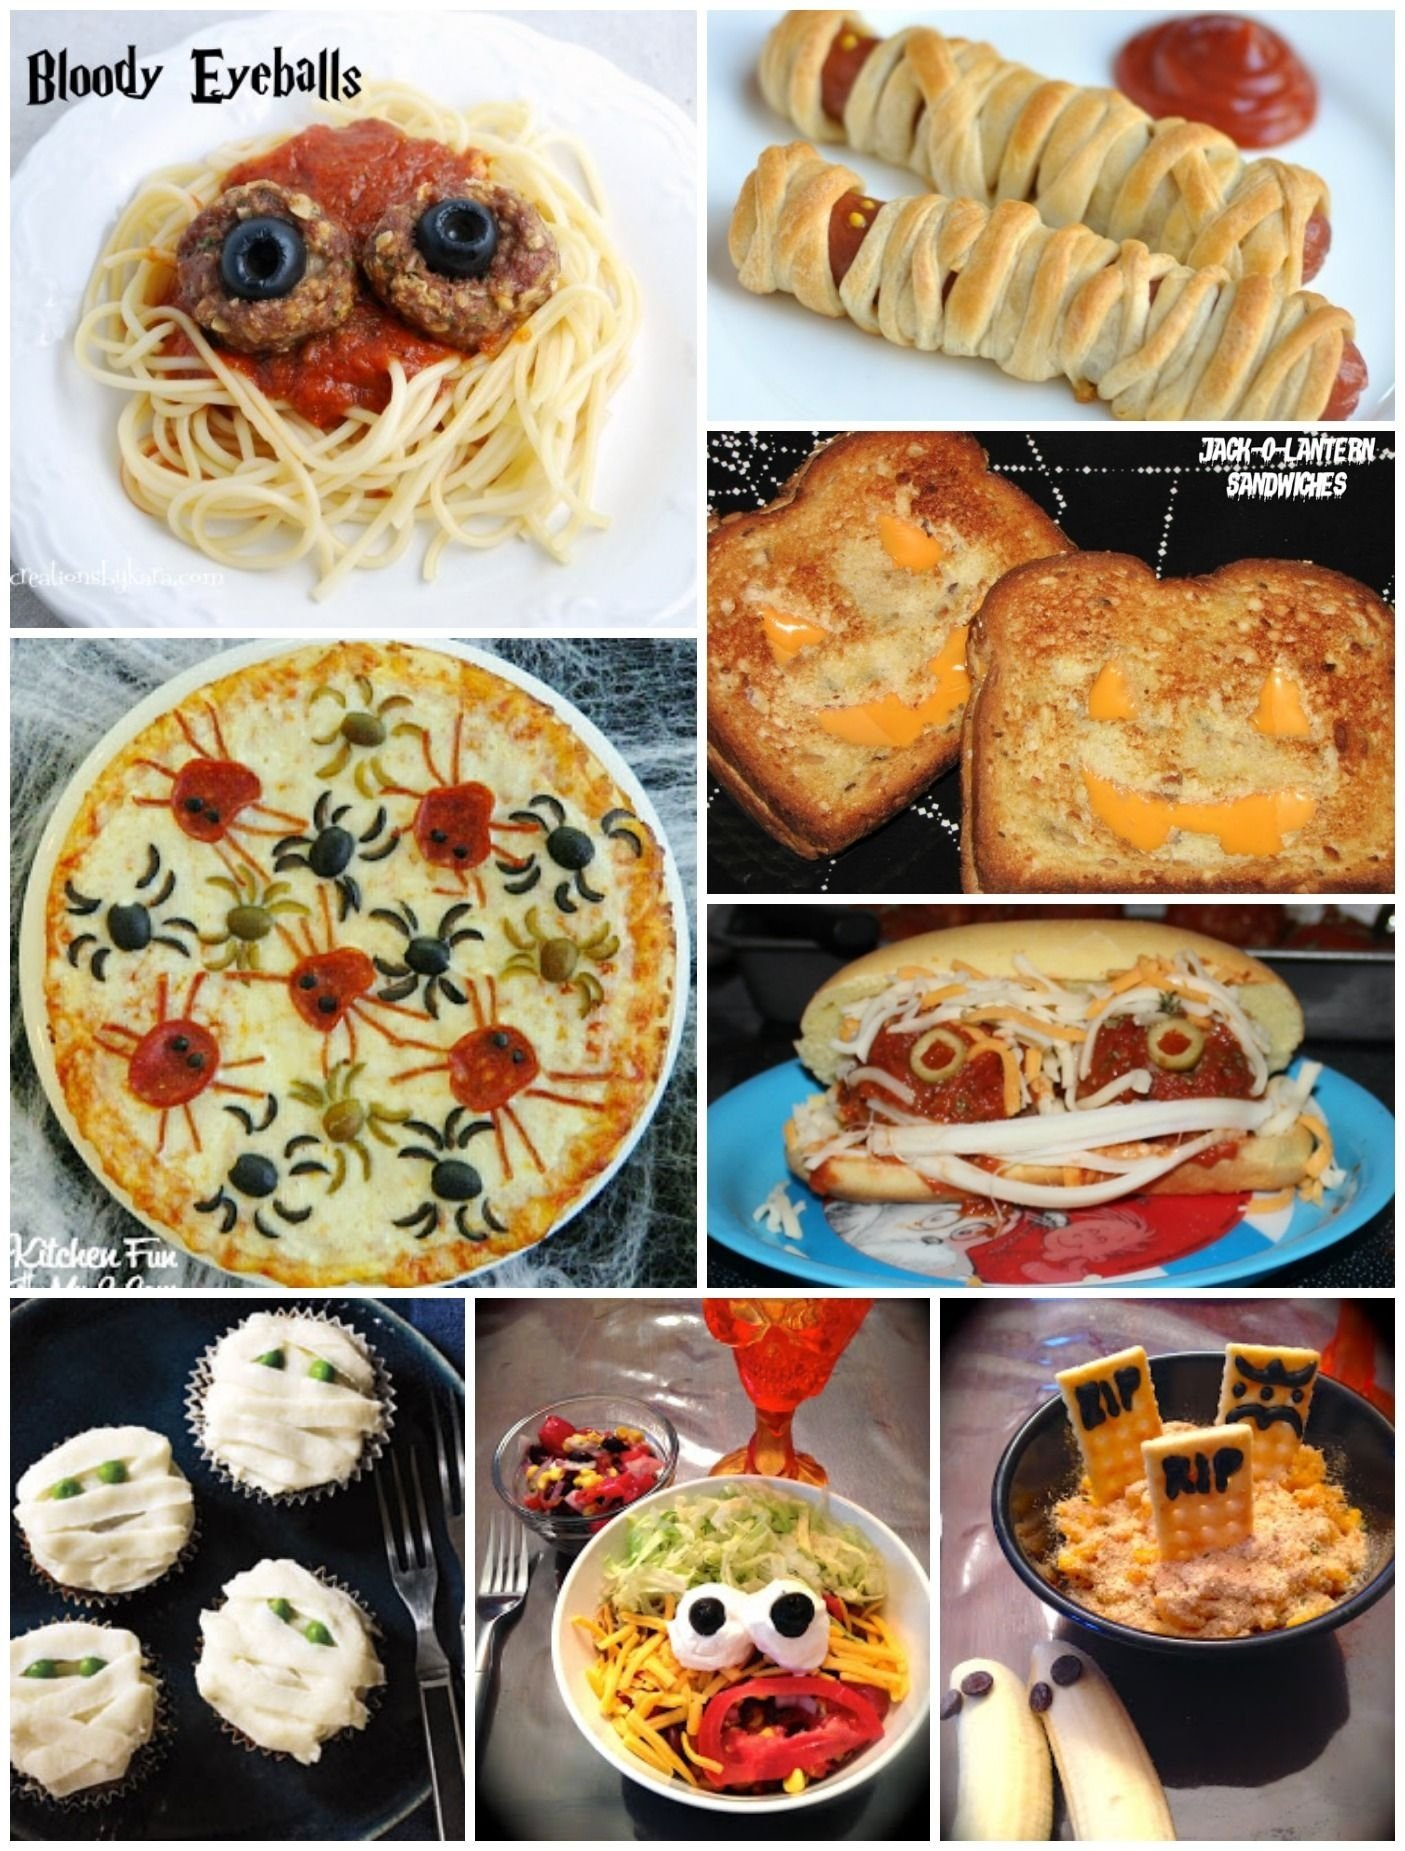 10 Cute Halloween Food Ideas For Parties monster sandwiches and fun halloween dinner ideas dinner ideas 5 2021